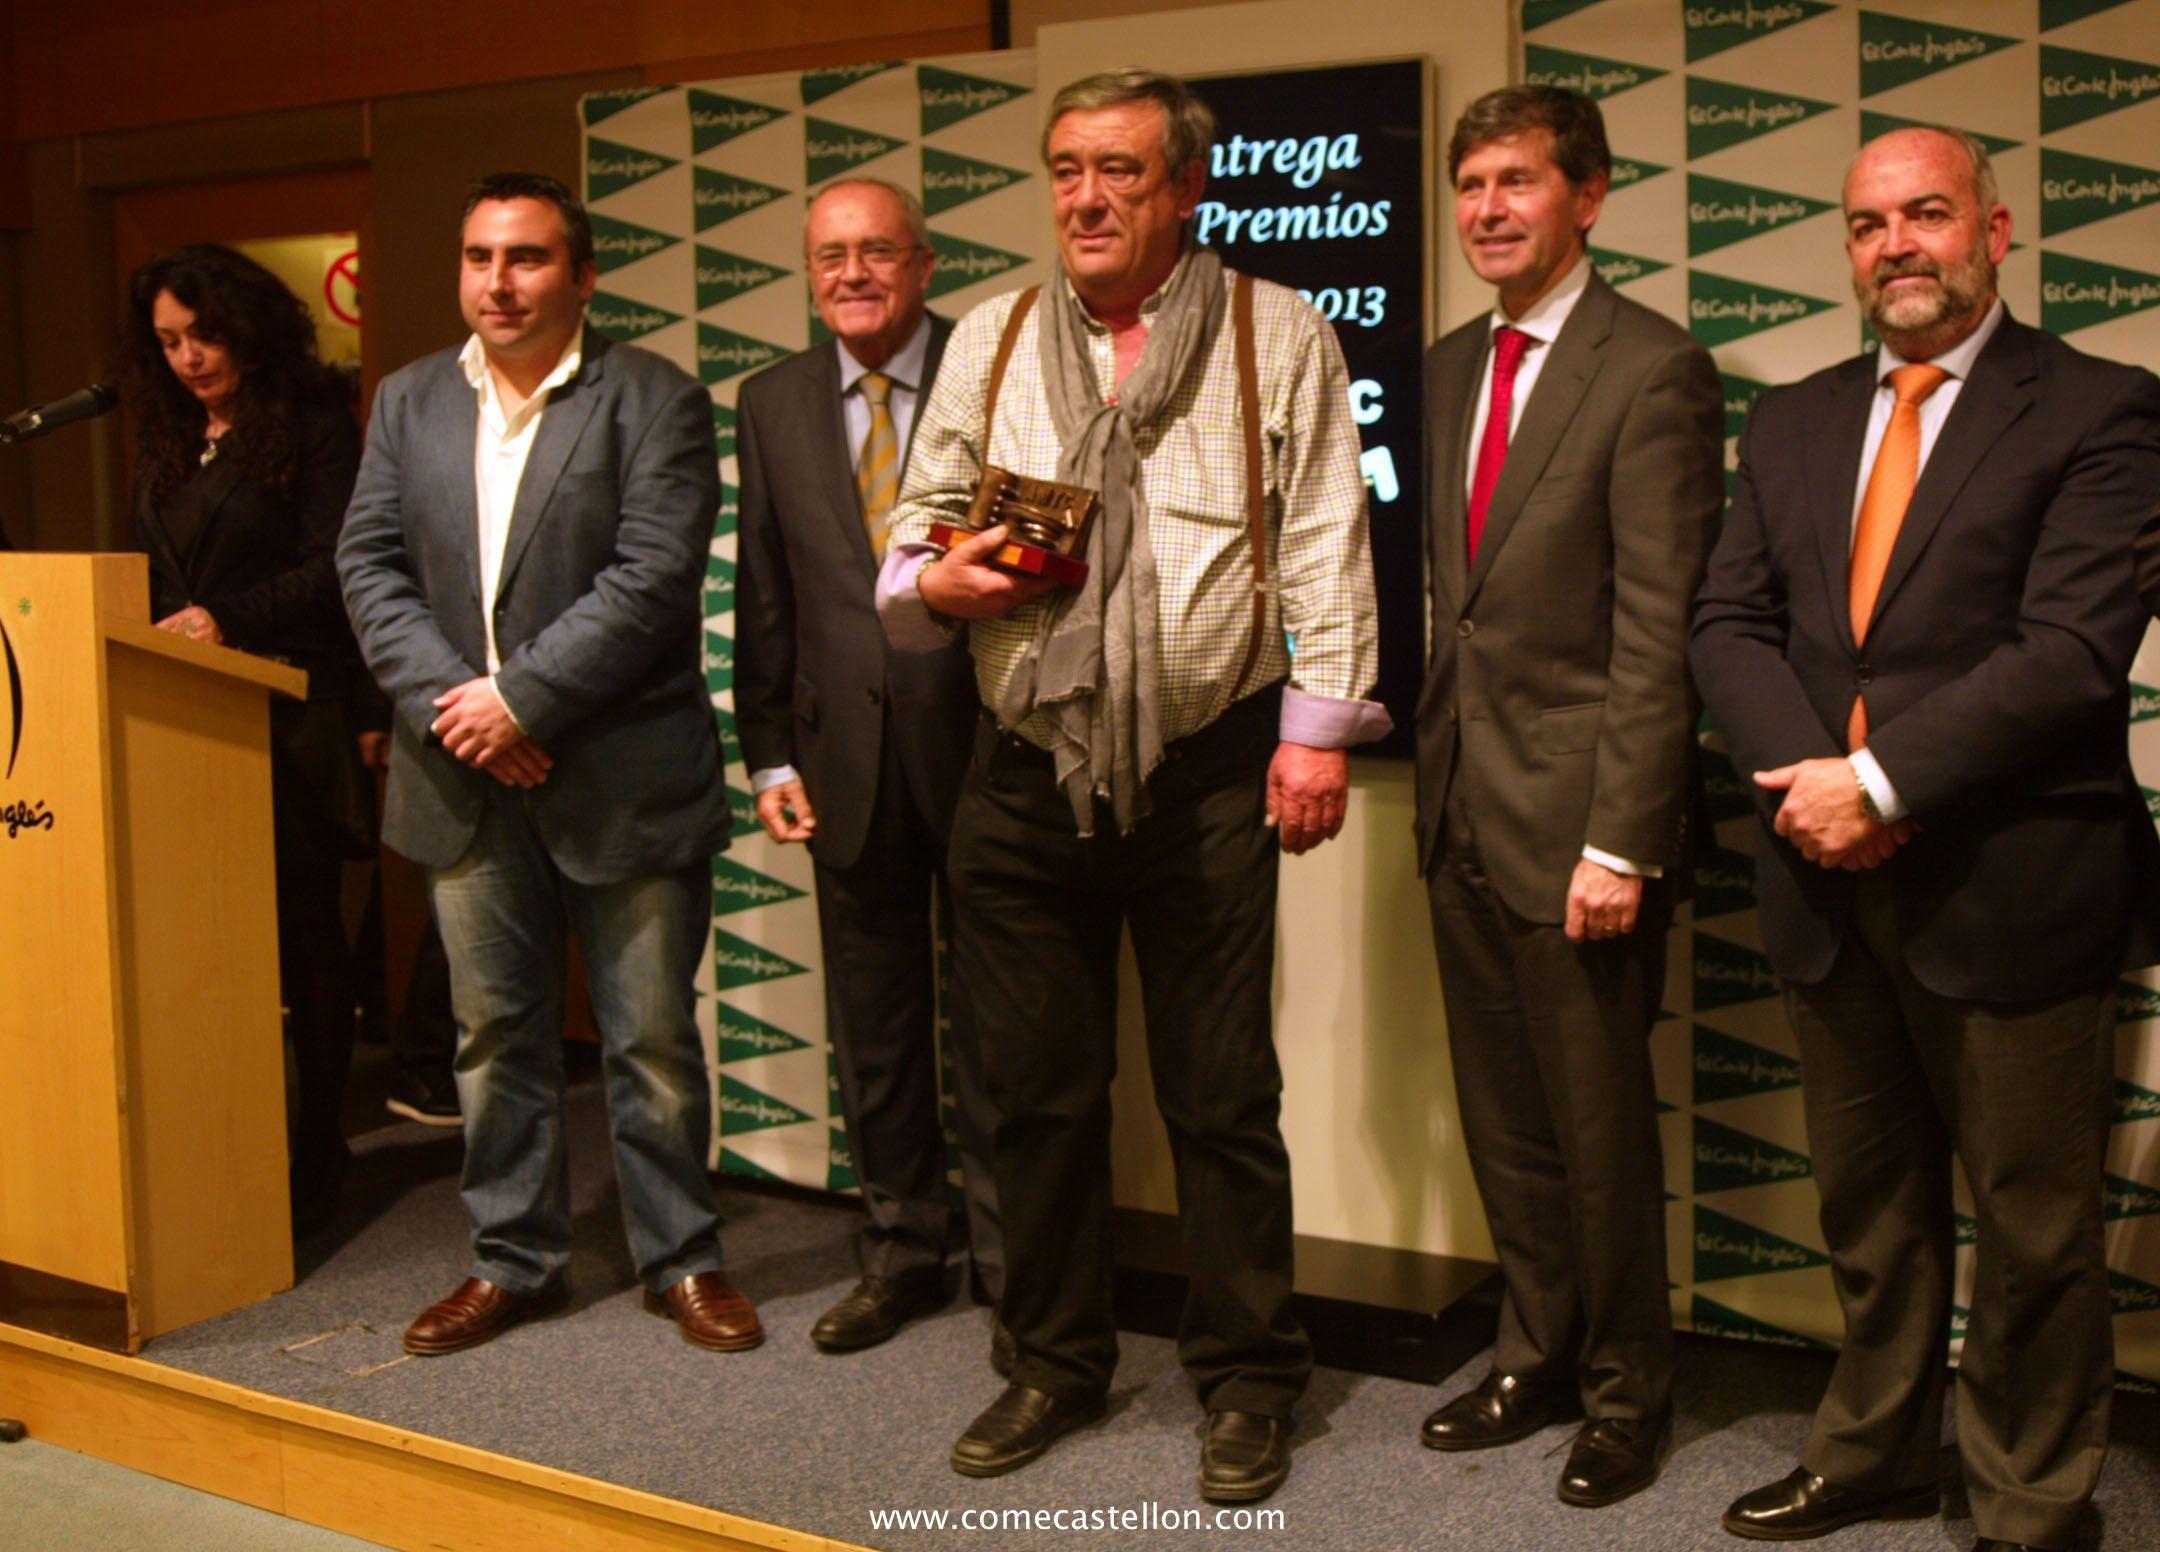 Premios 2013 AMTC castellon